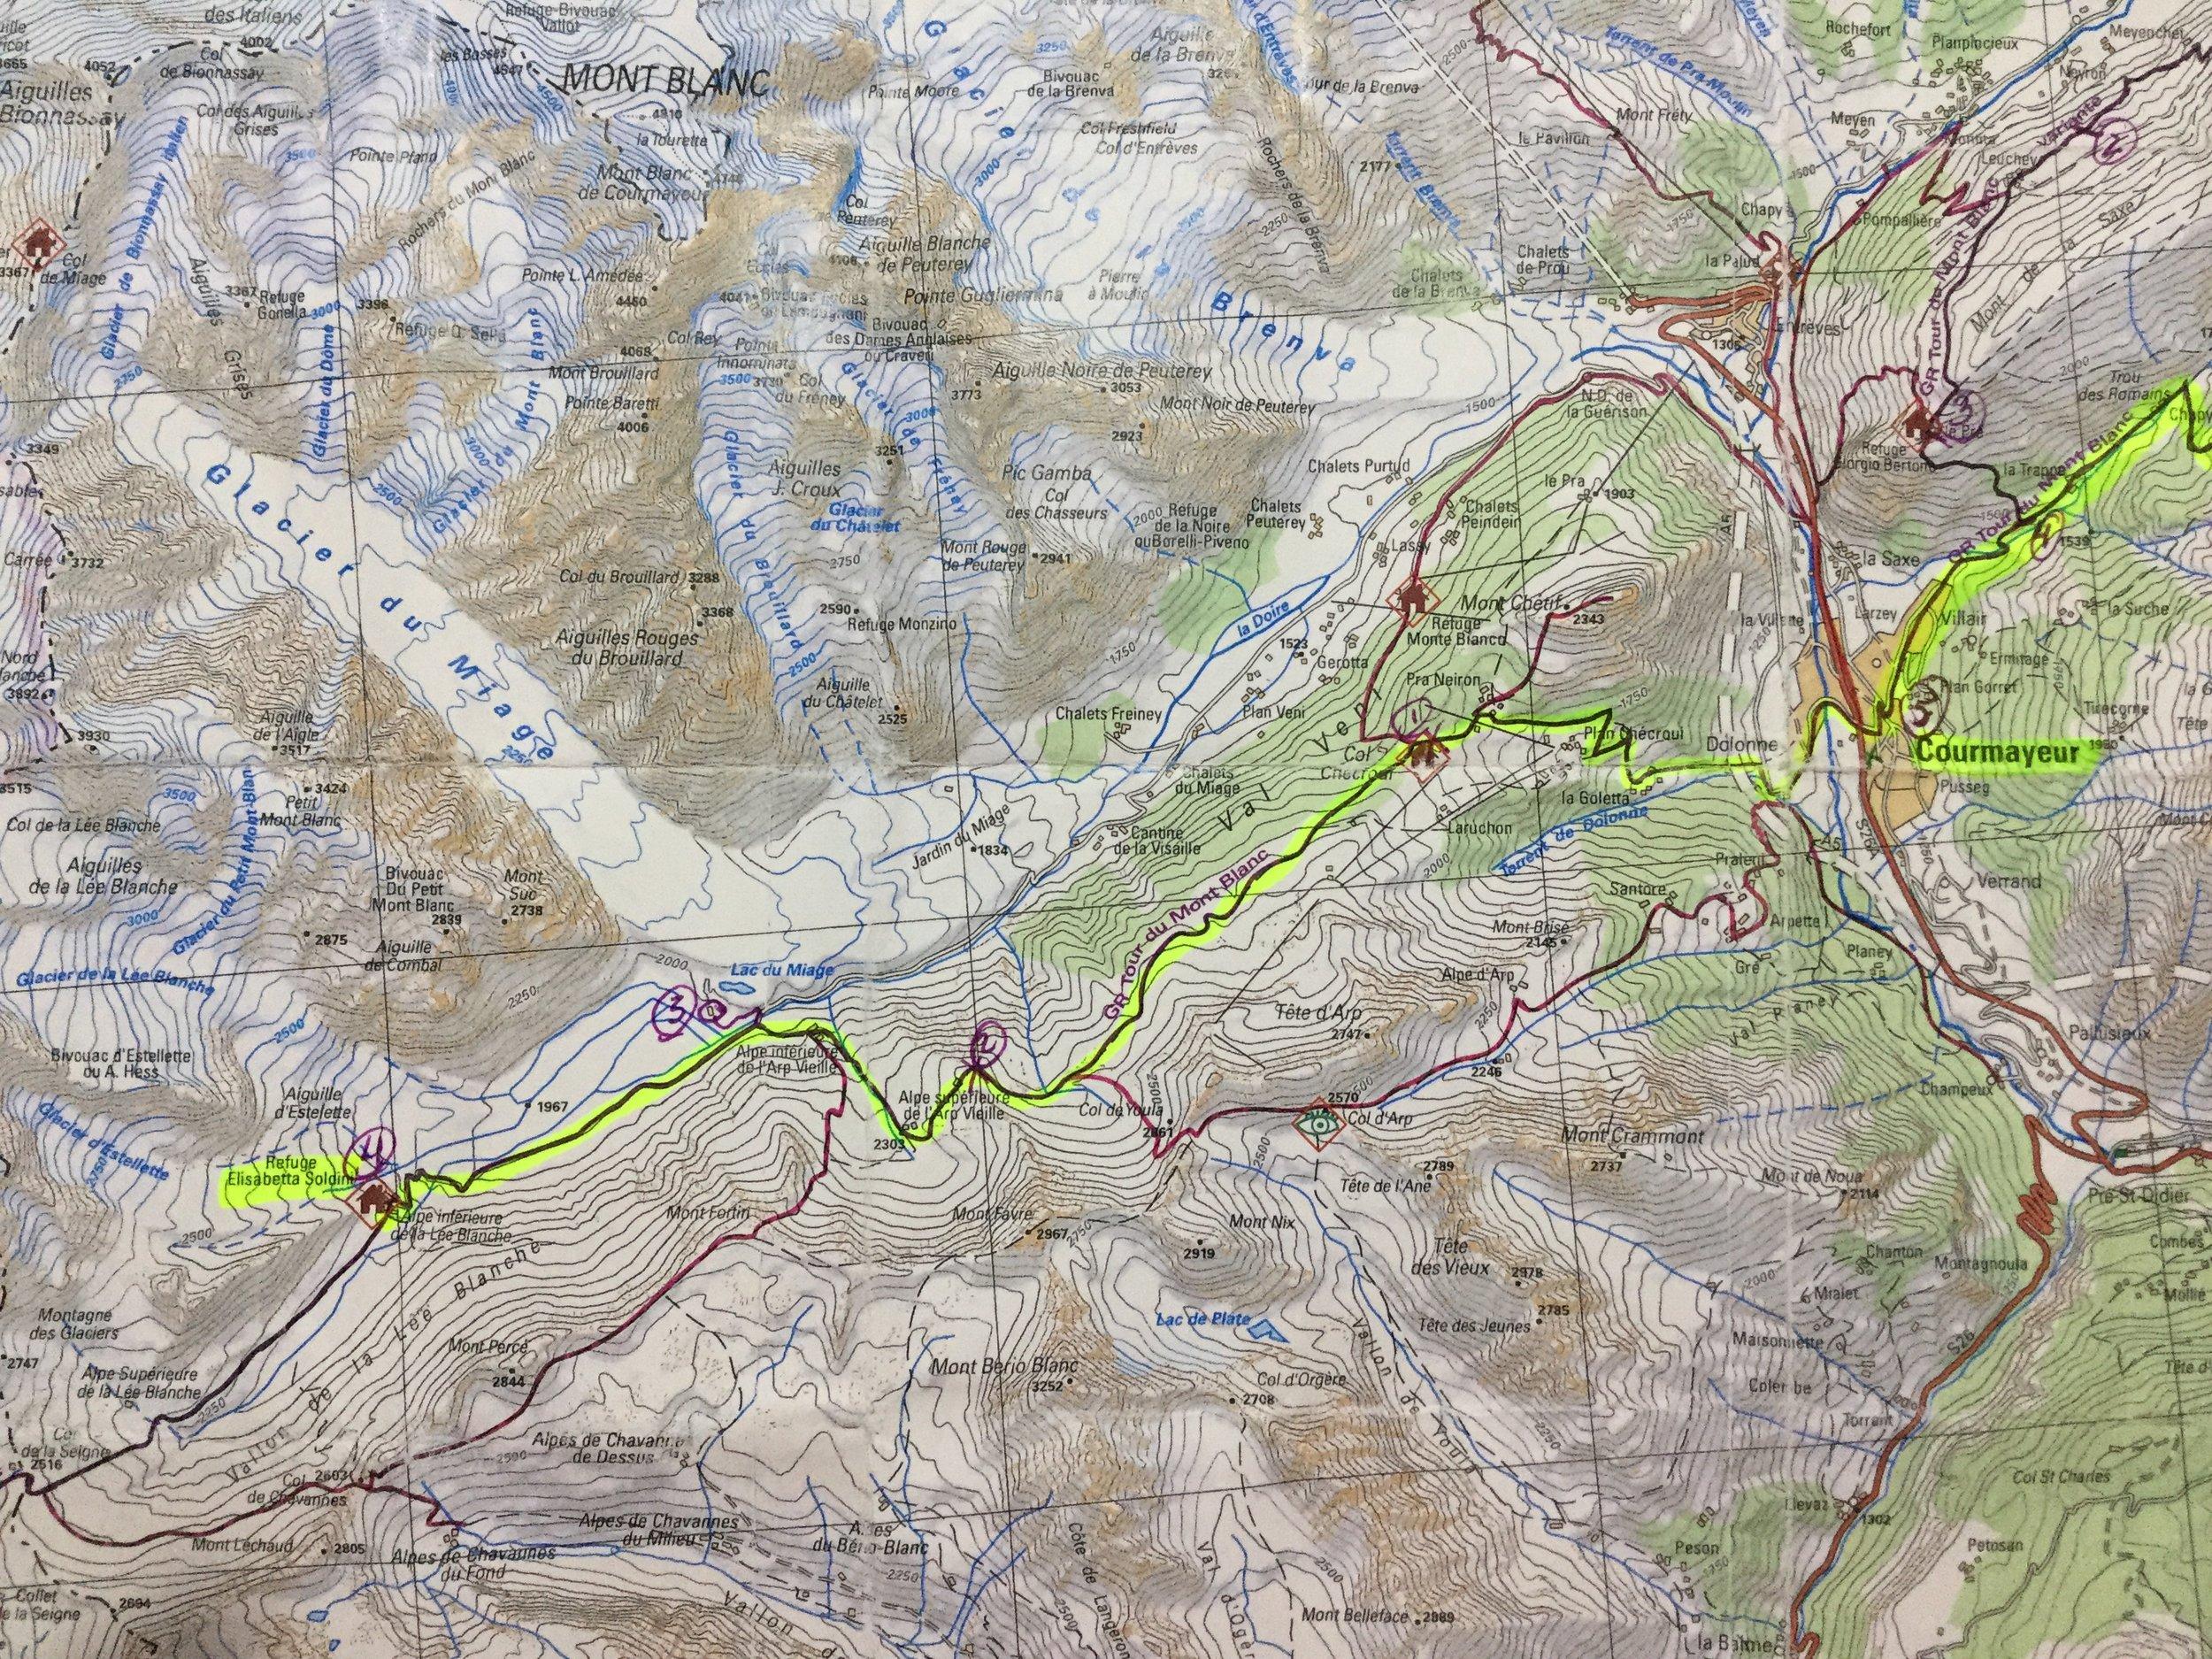 Day 4 Hike from Courmayeur to Refuge Elizabetta